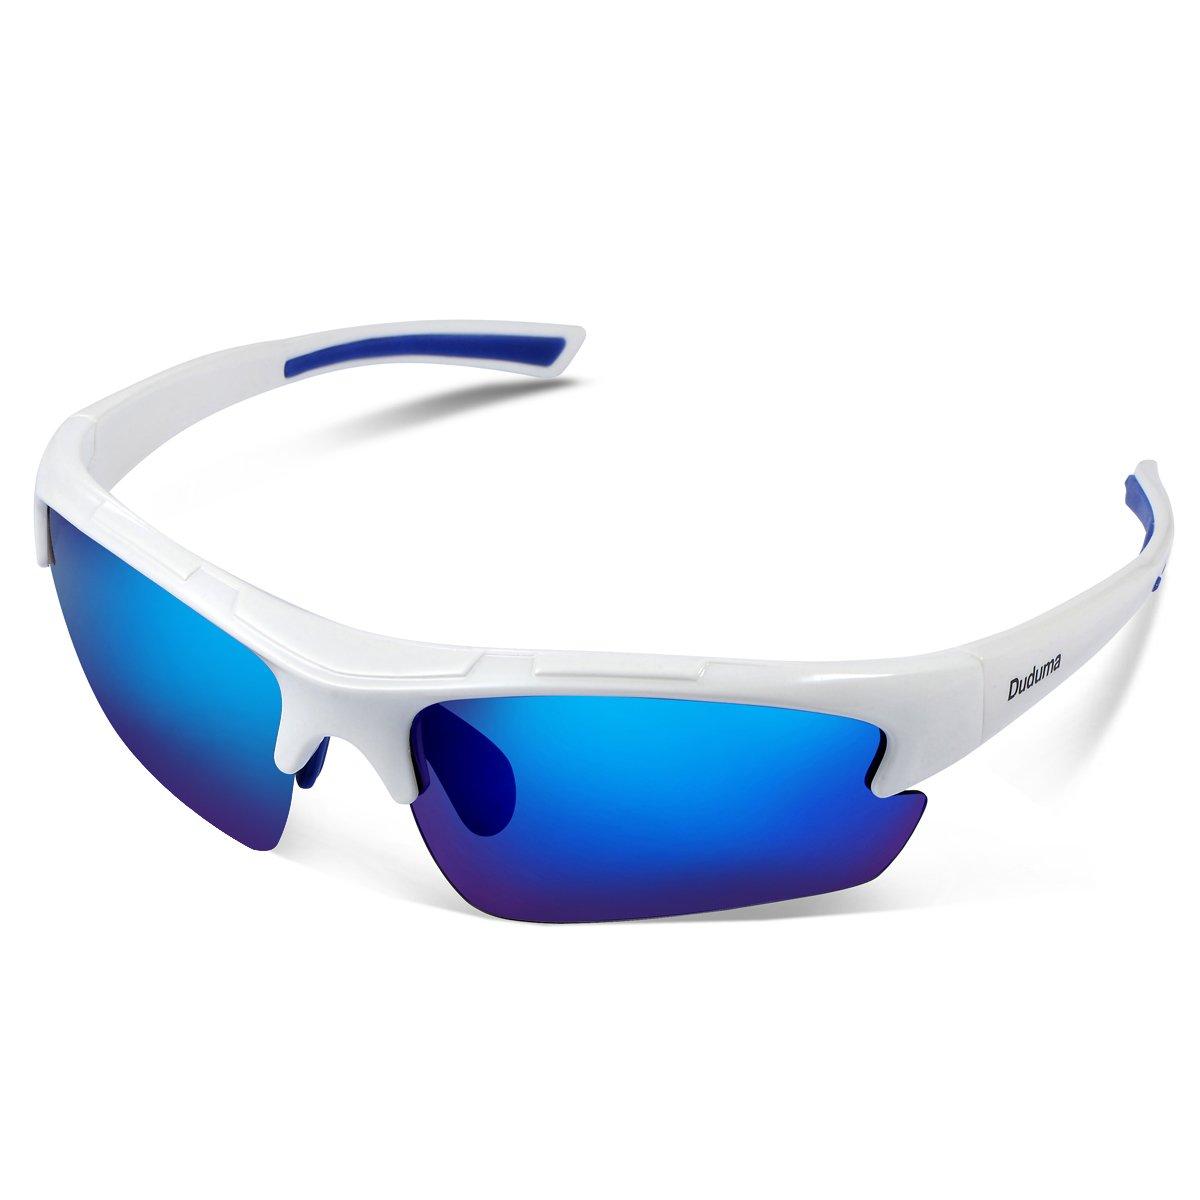 Duduma Polarized Designer Fashion Sports Sunglasses for Baseball Cycling Fishing Golf Tr62 Superlight Frame (White/Blue) by Duduma